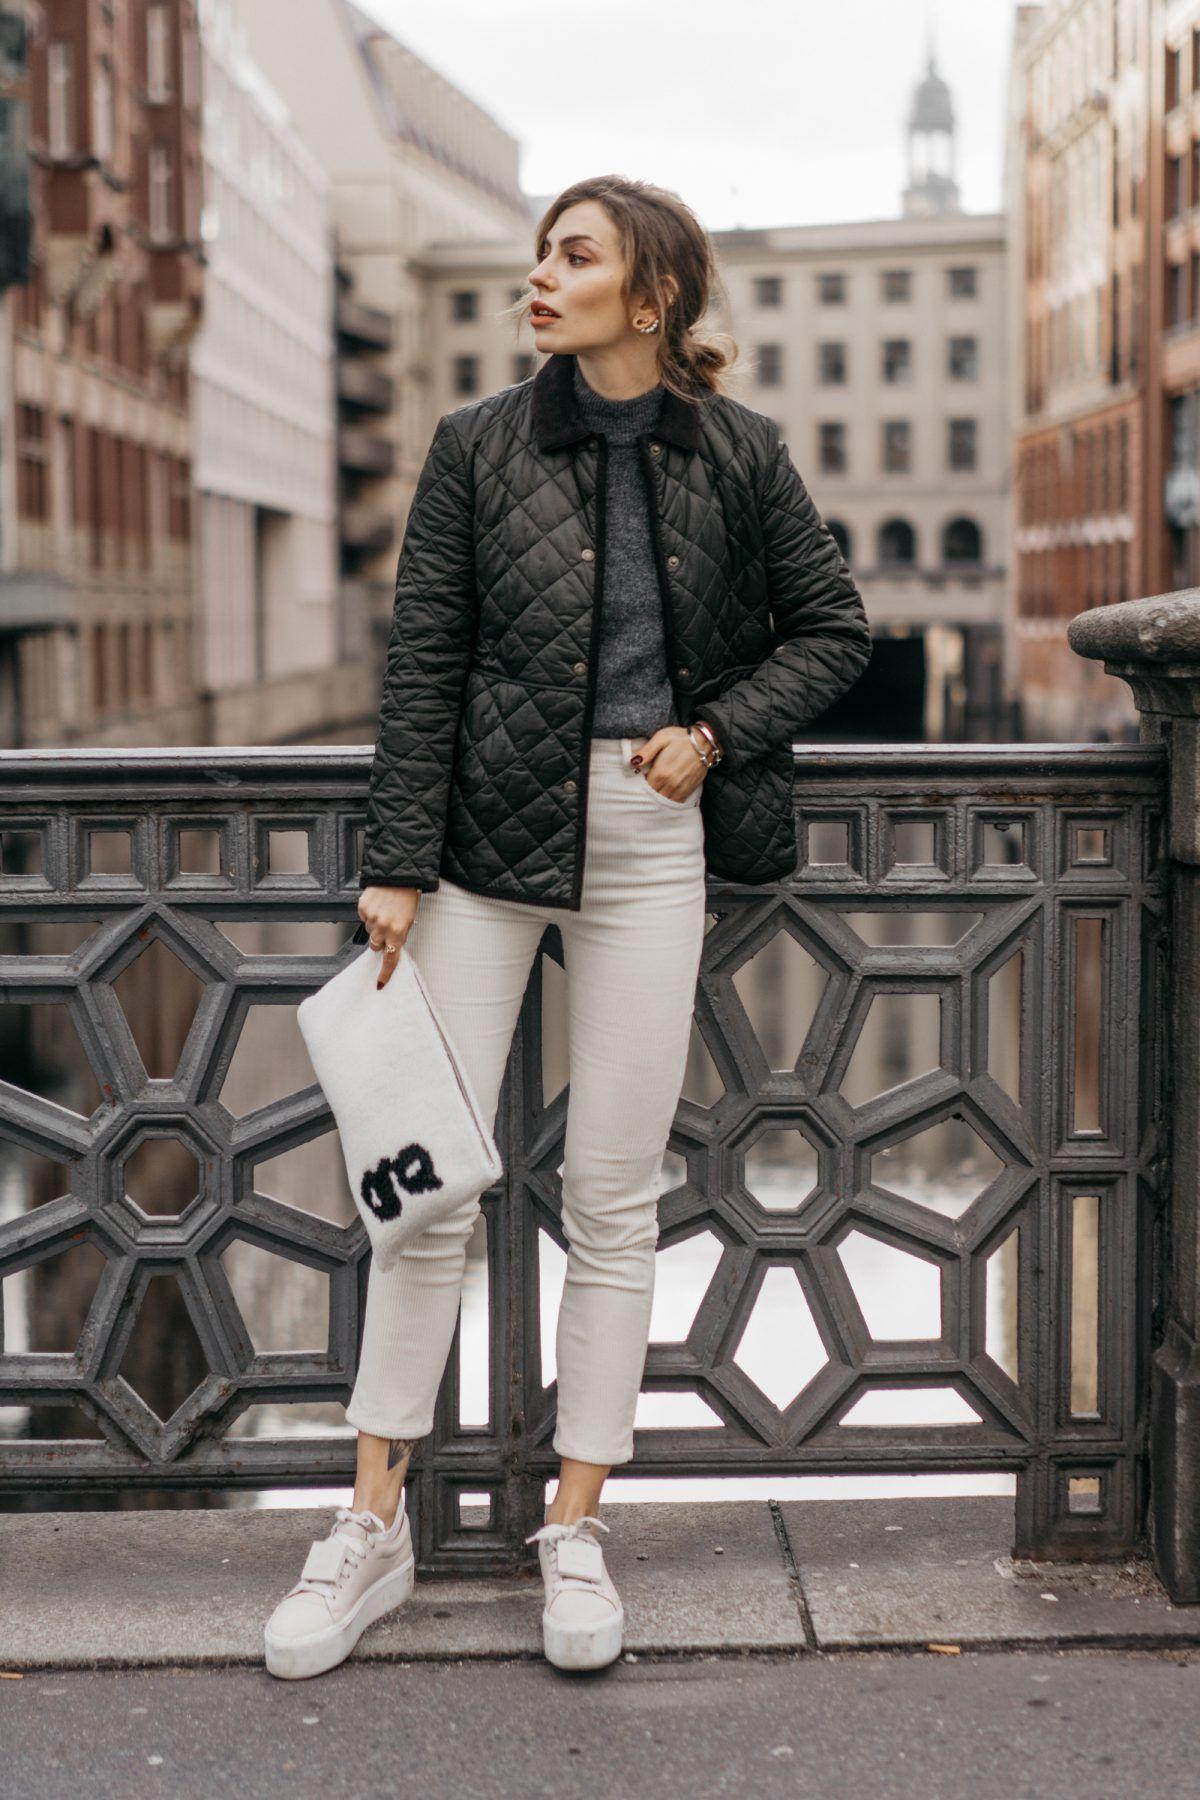 the hamburg style – fashion blog from germany / modeblog aus